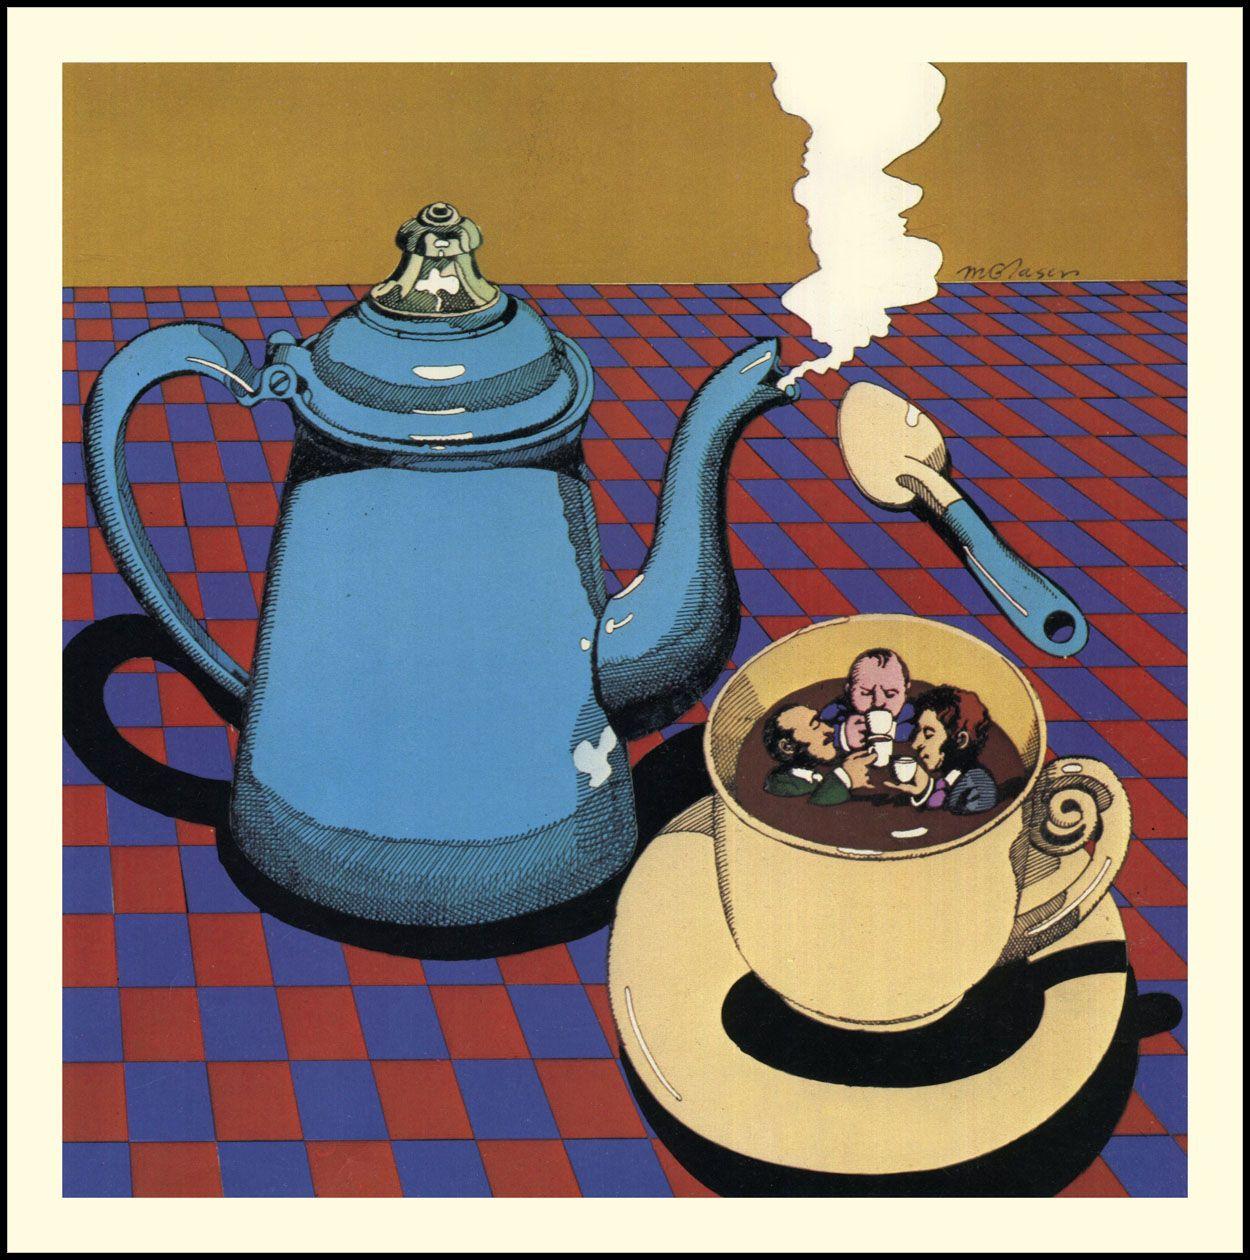 Milton Glaser-Coffee taste testers – BLCKDMNDS